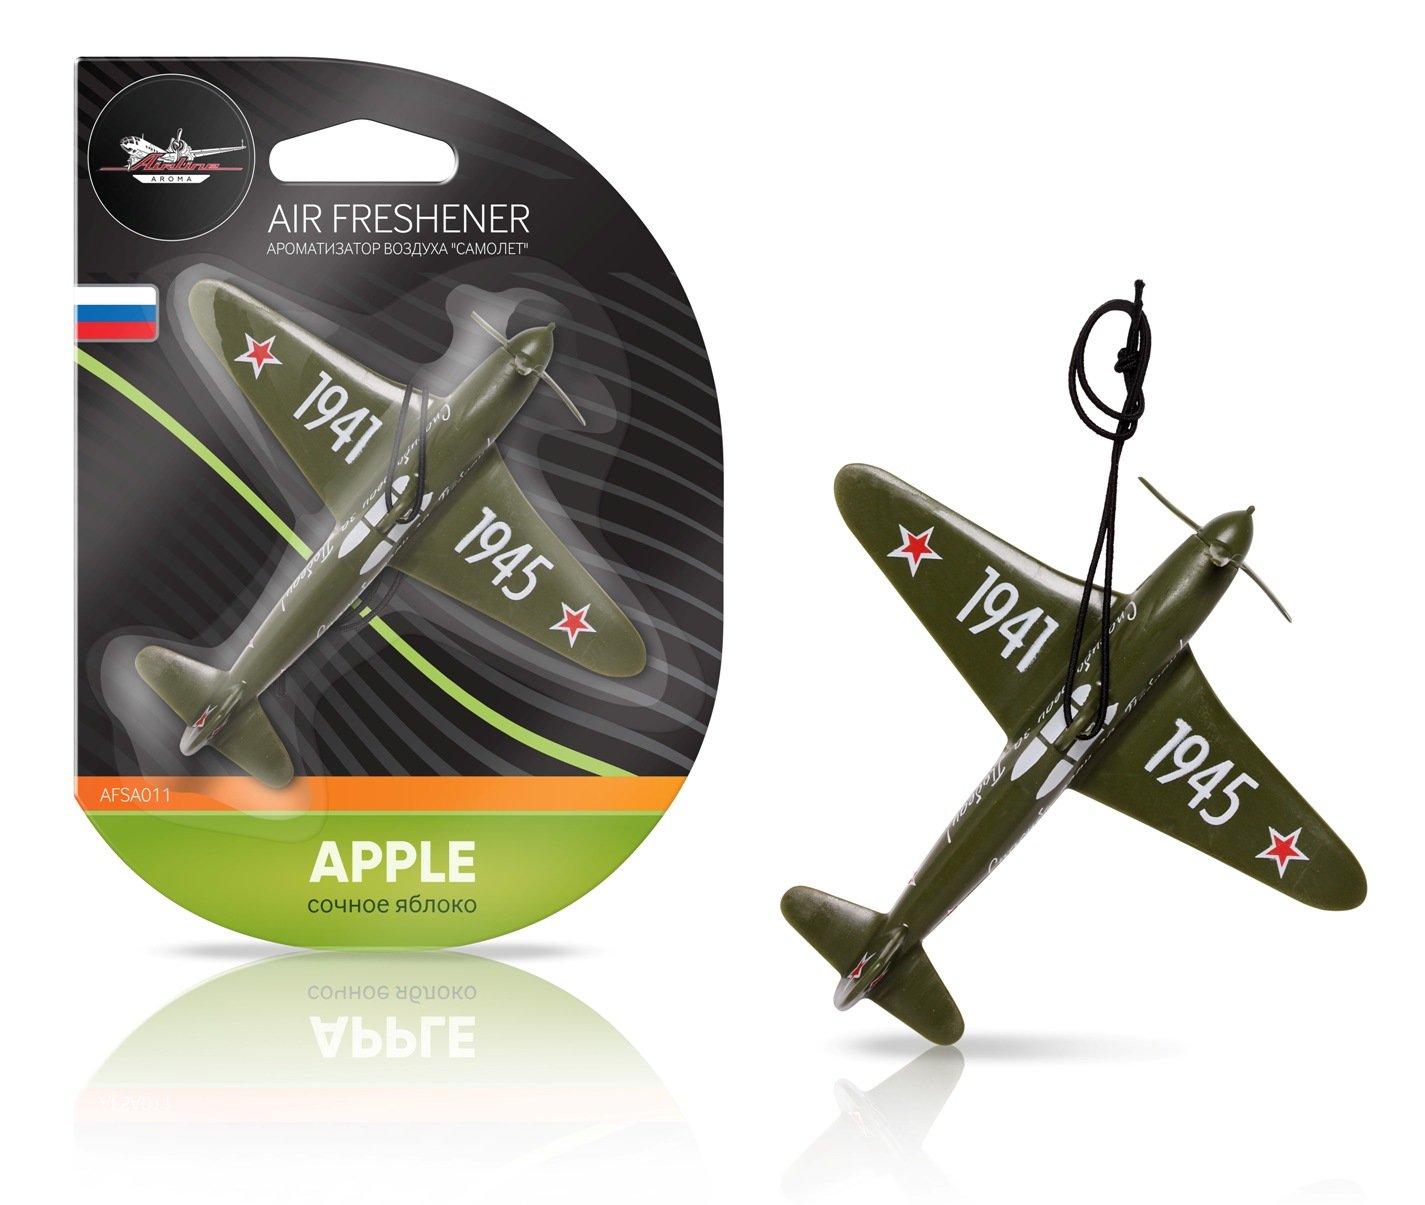 Ароматизатор на зеркало Airline самолет сочное яблоко AFSA011